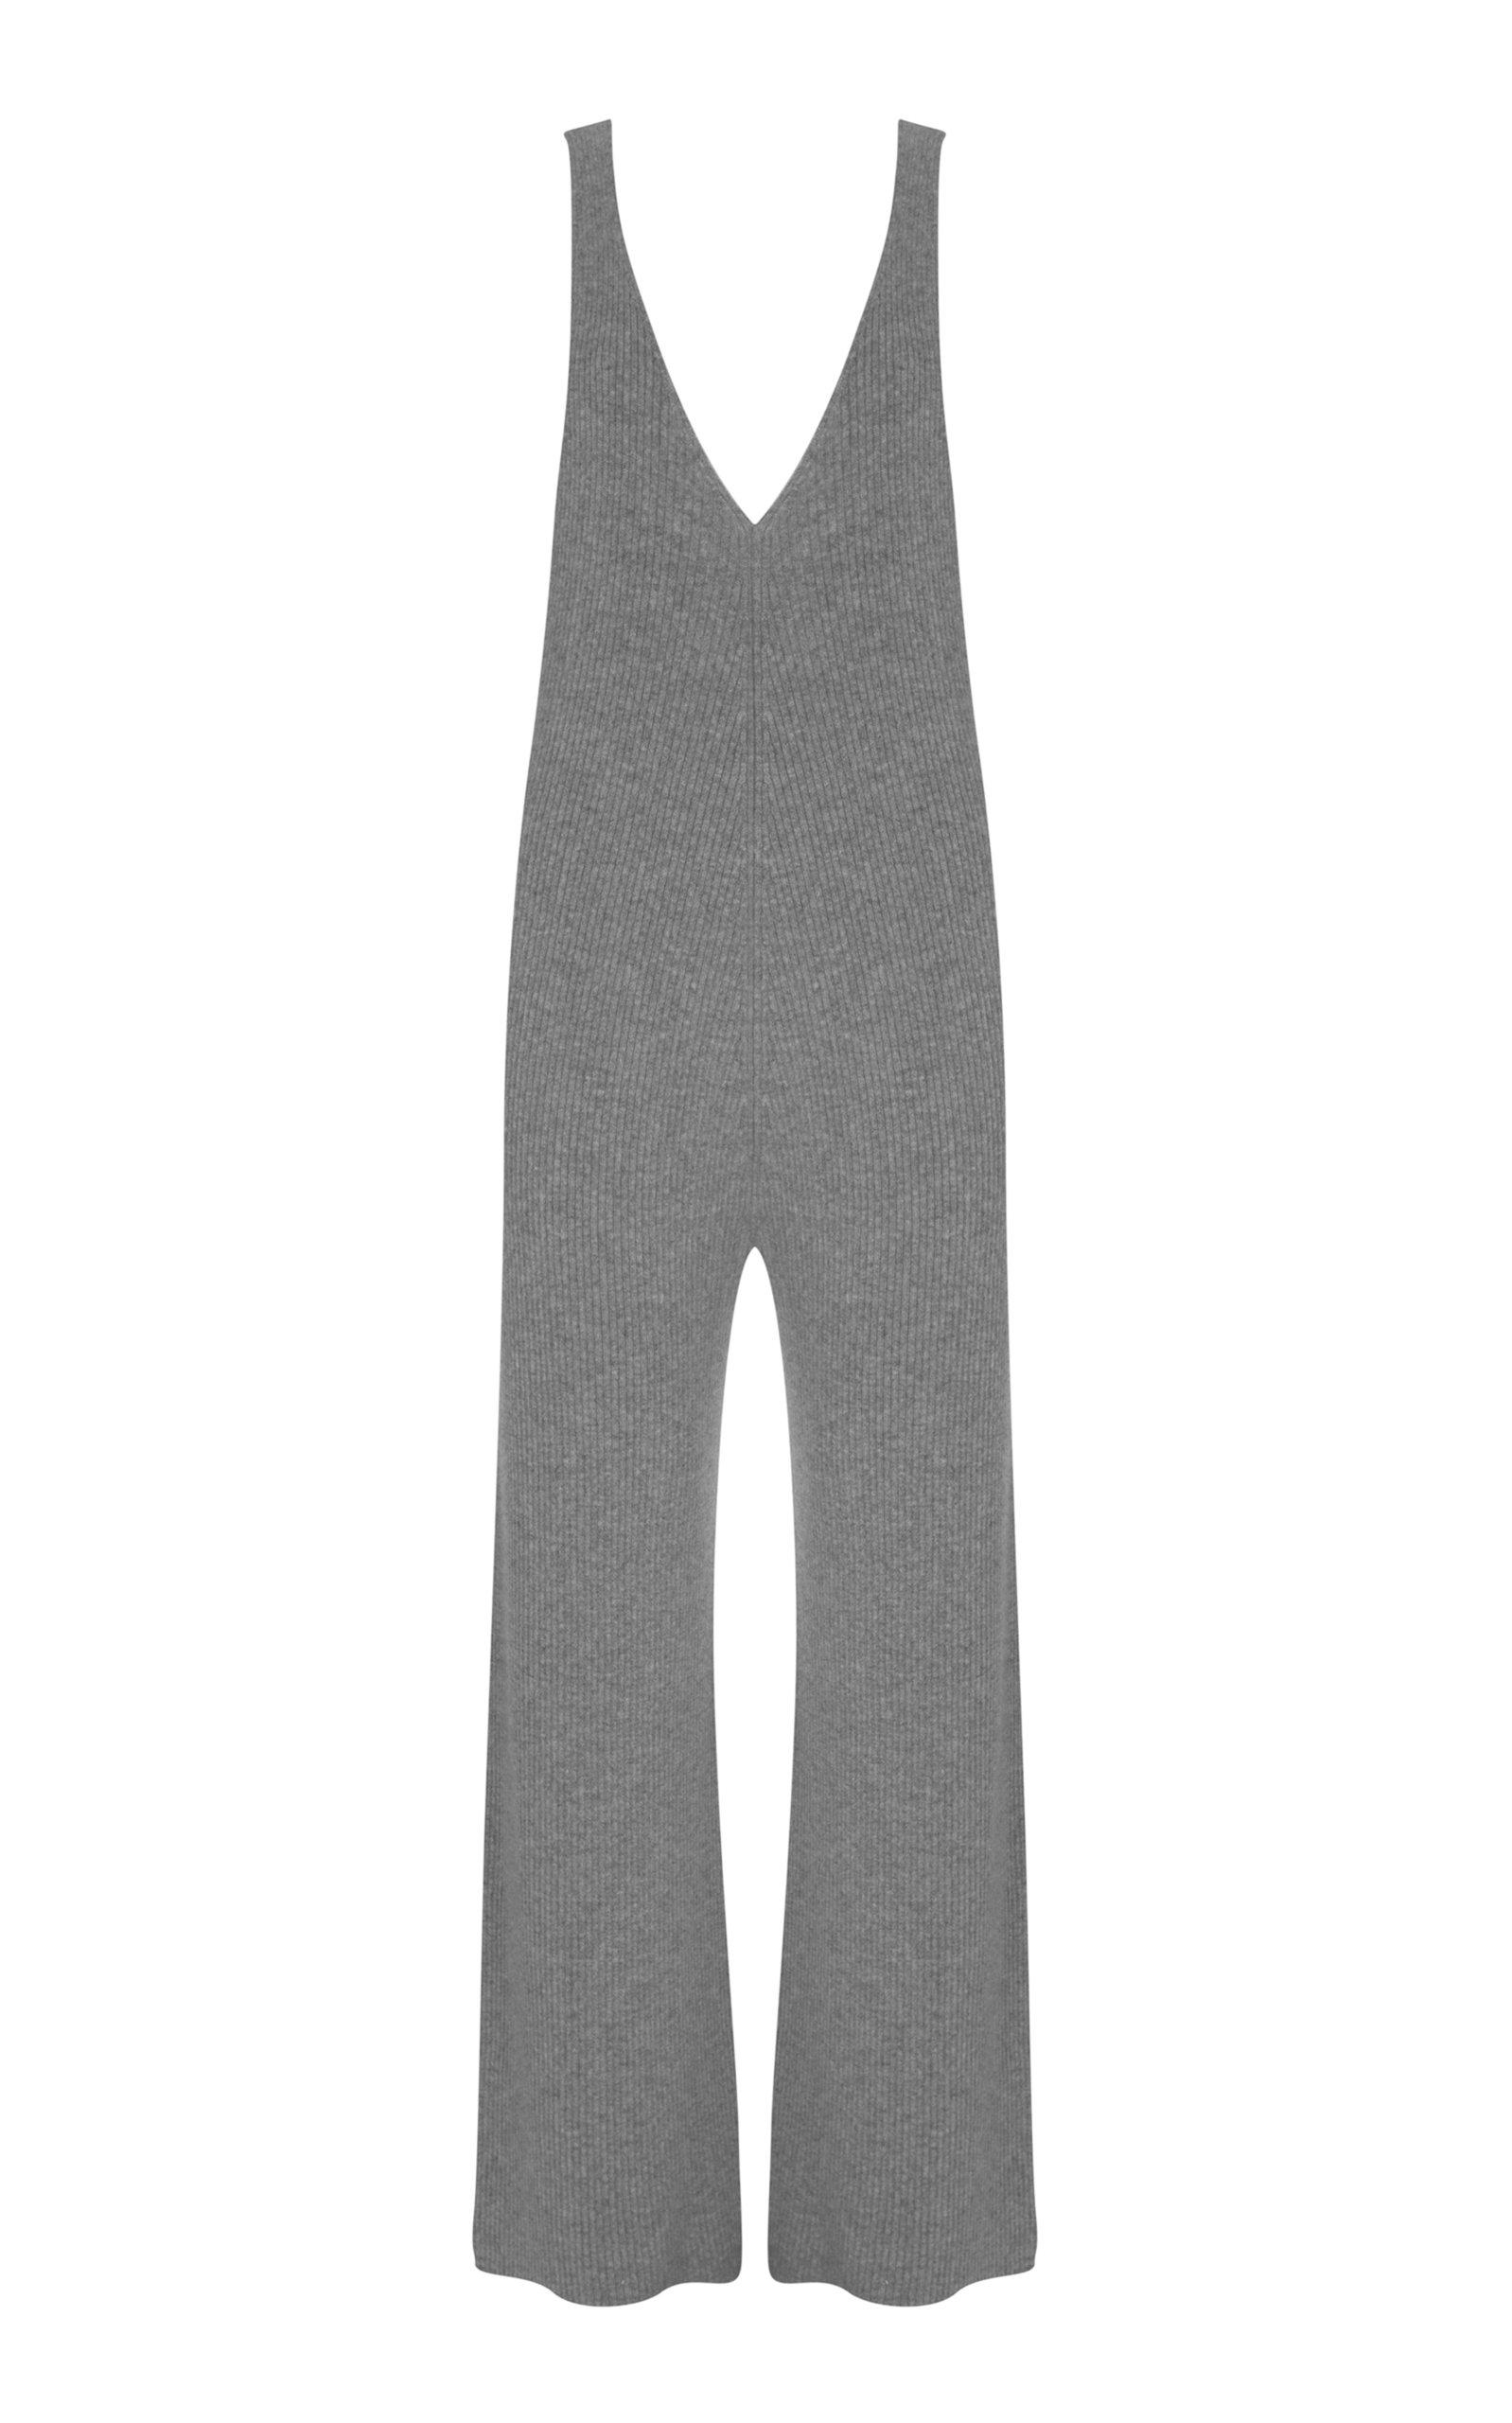 214fa5c056e Madeleine ThompsonProspero Cashmere V-Neck Jumpsuit. CLOSE. Loading